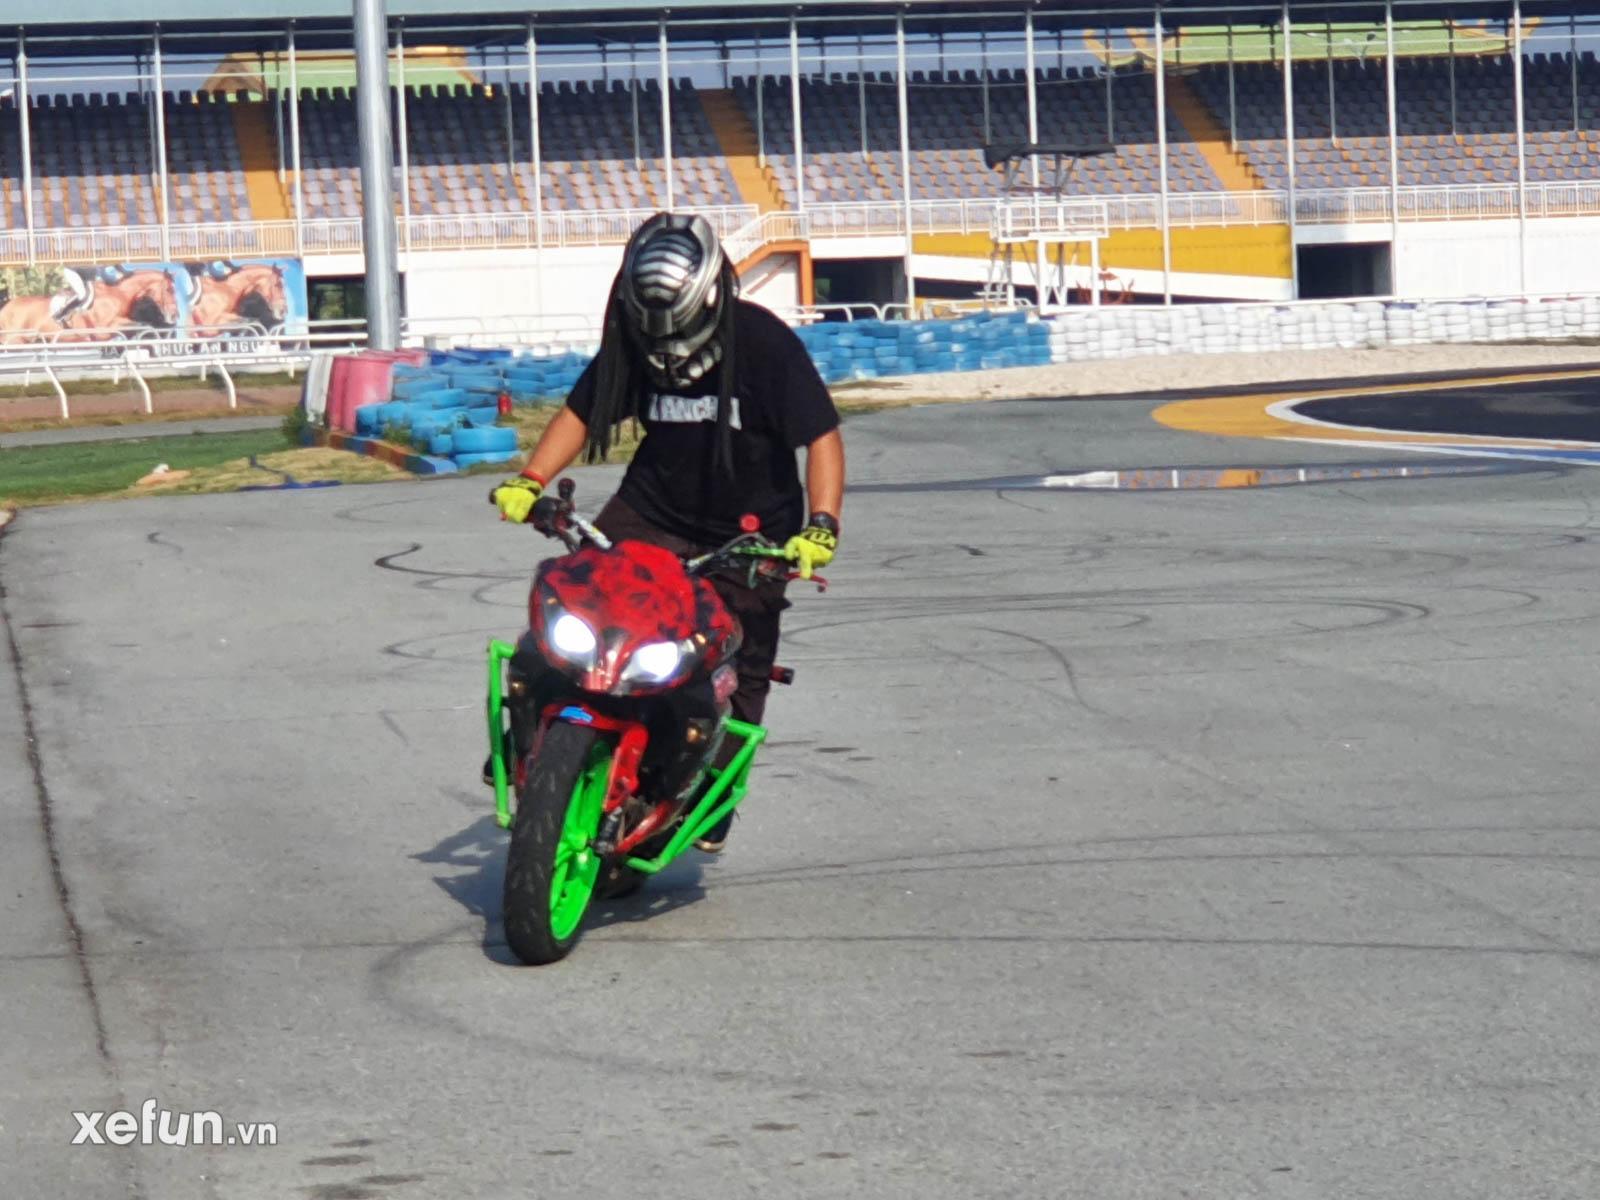 Tin mới nhất Giải đua xe Môtô Awakening Road 2021 Xefun - 2 (26)565465